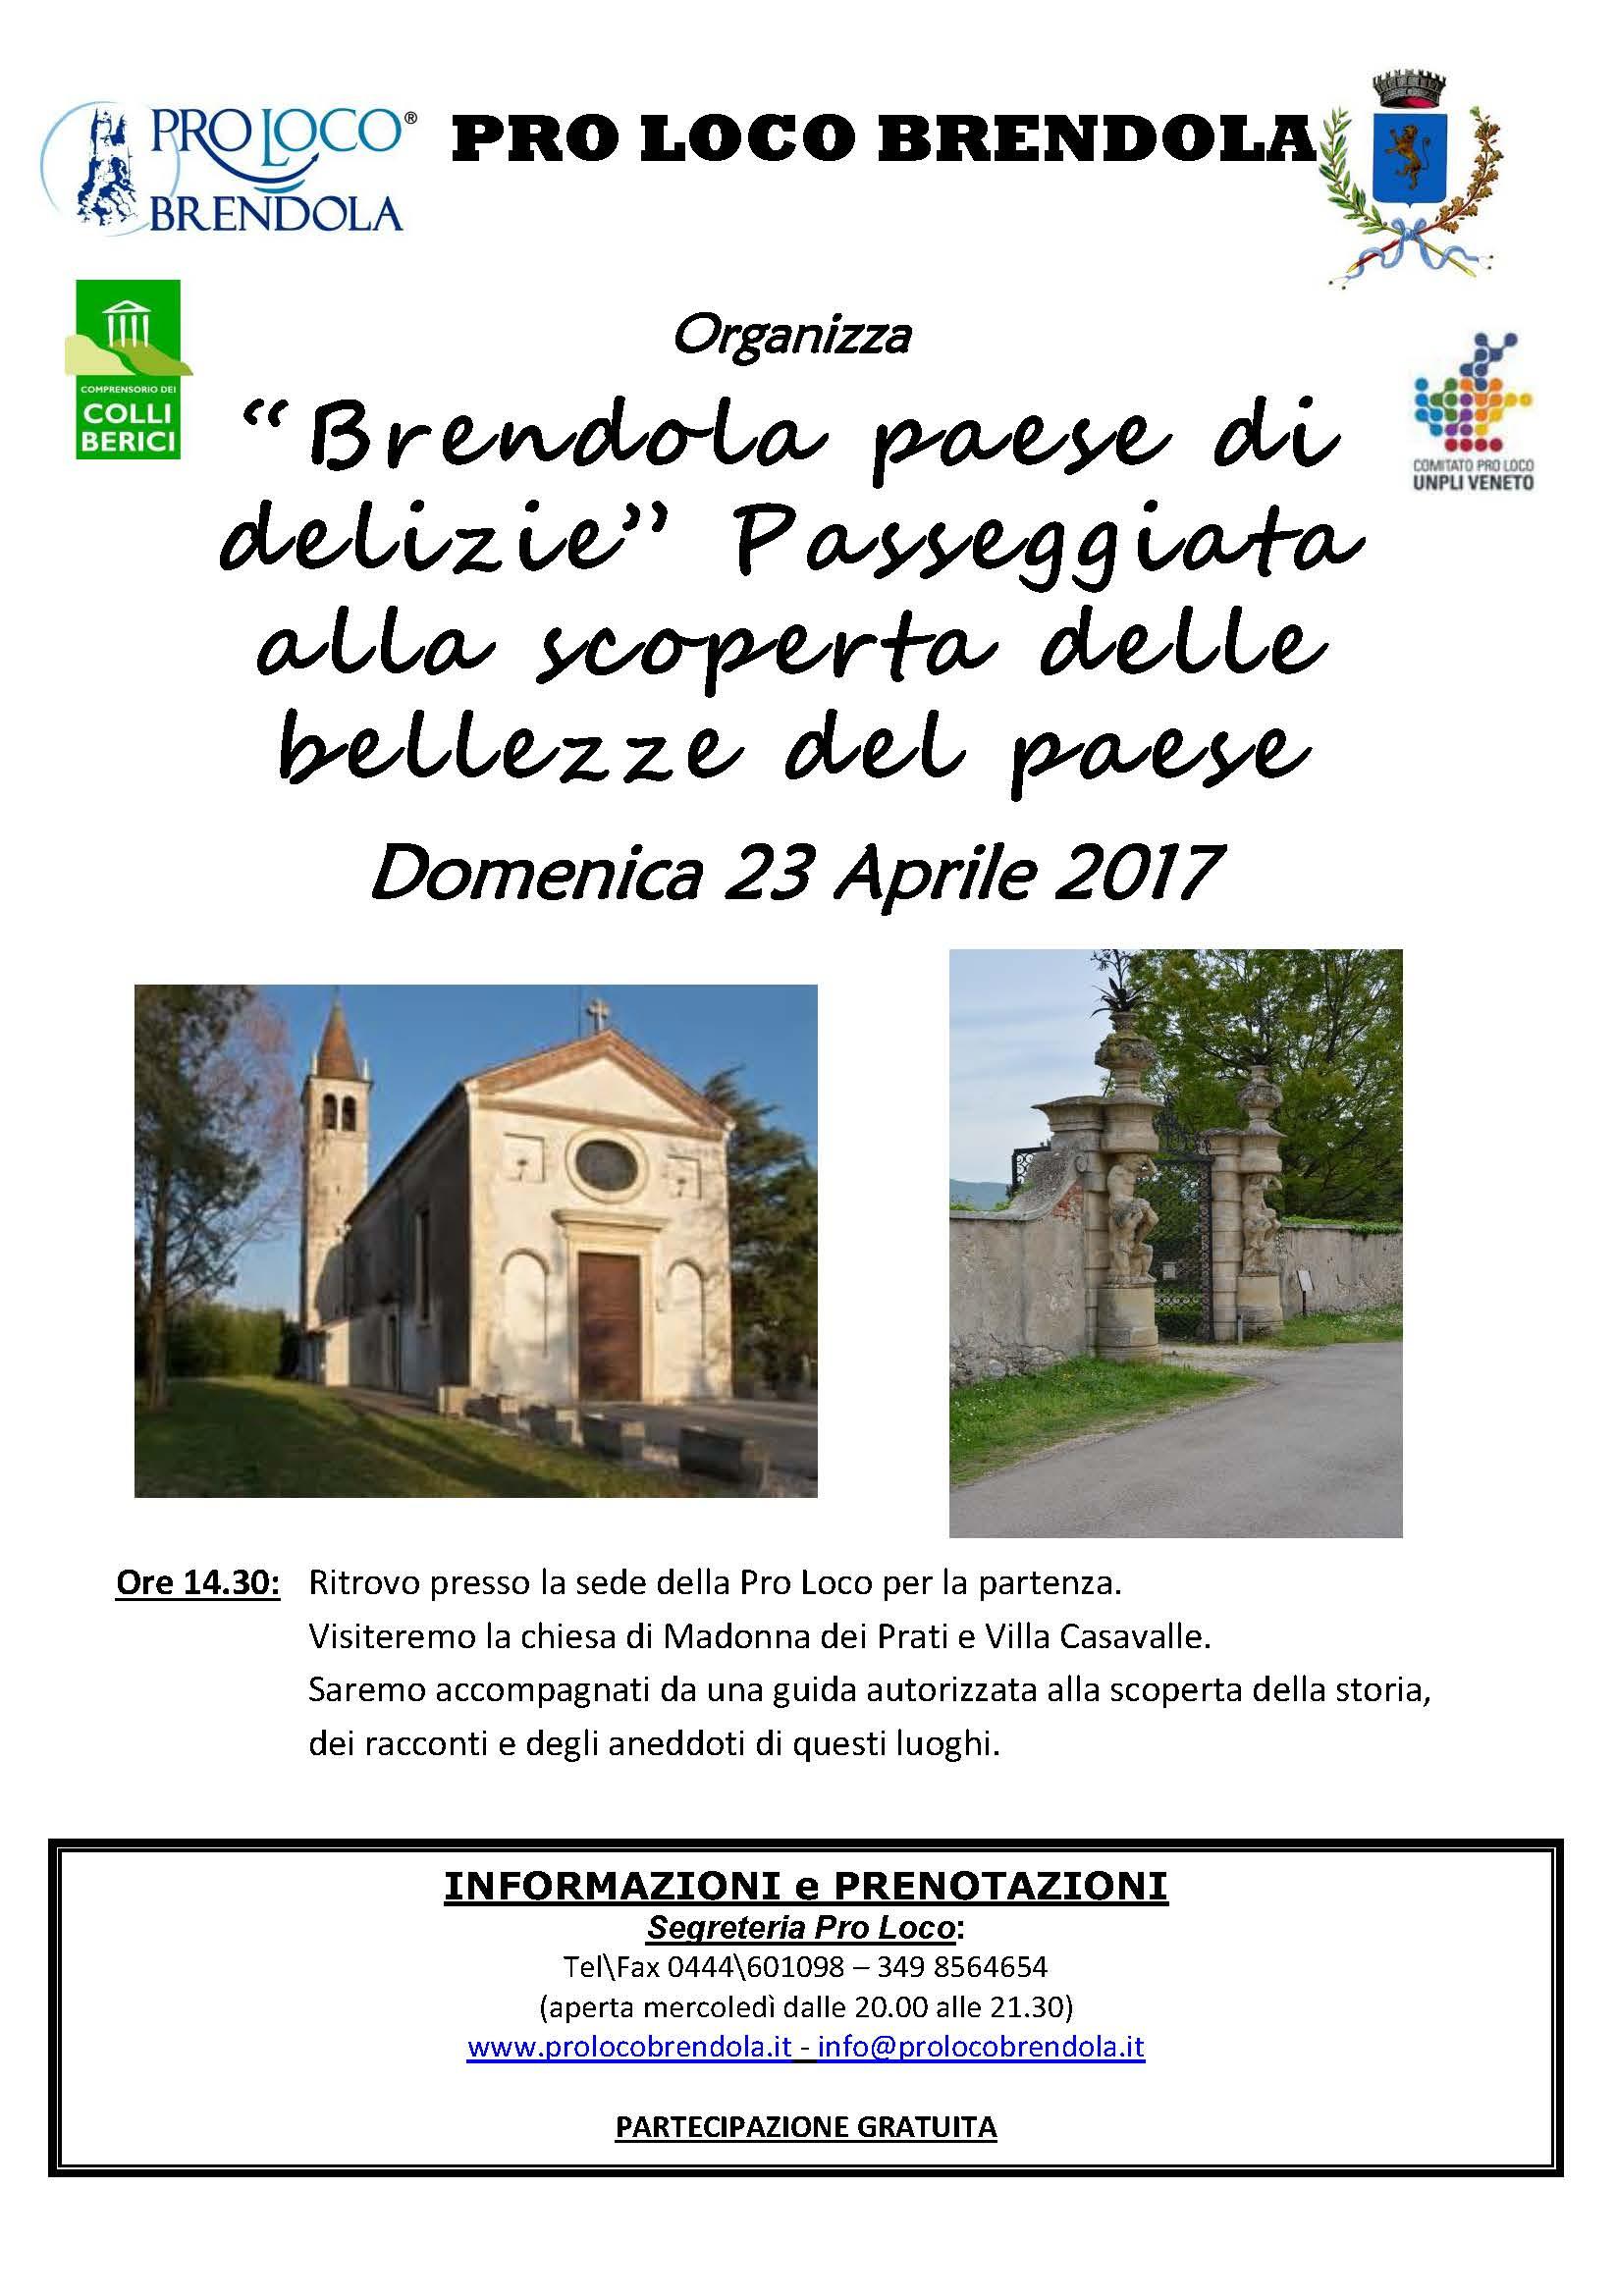 Passeggiata centro storico 23.04.2017